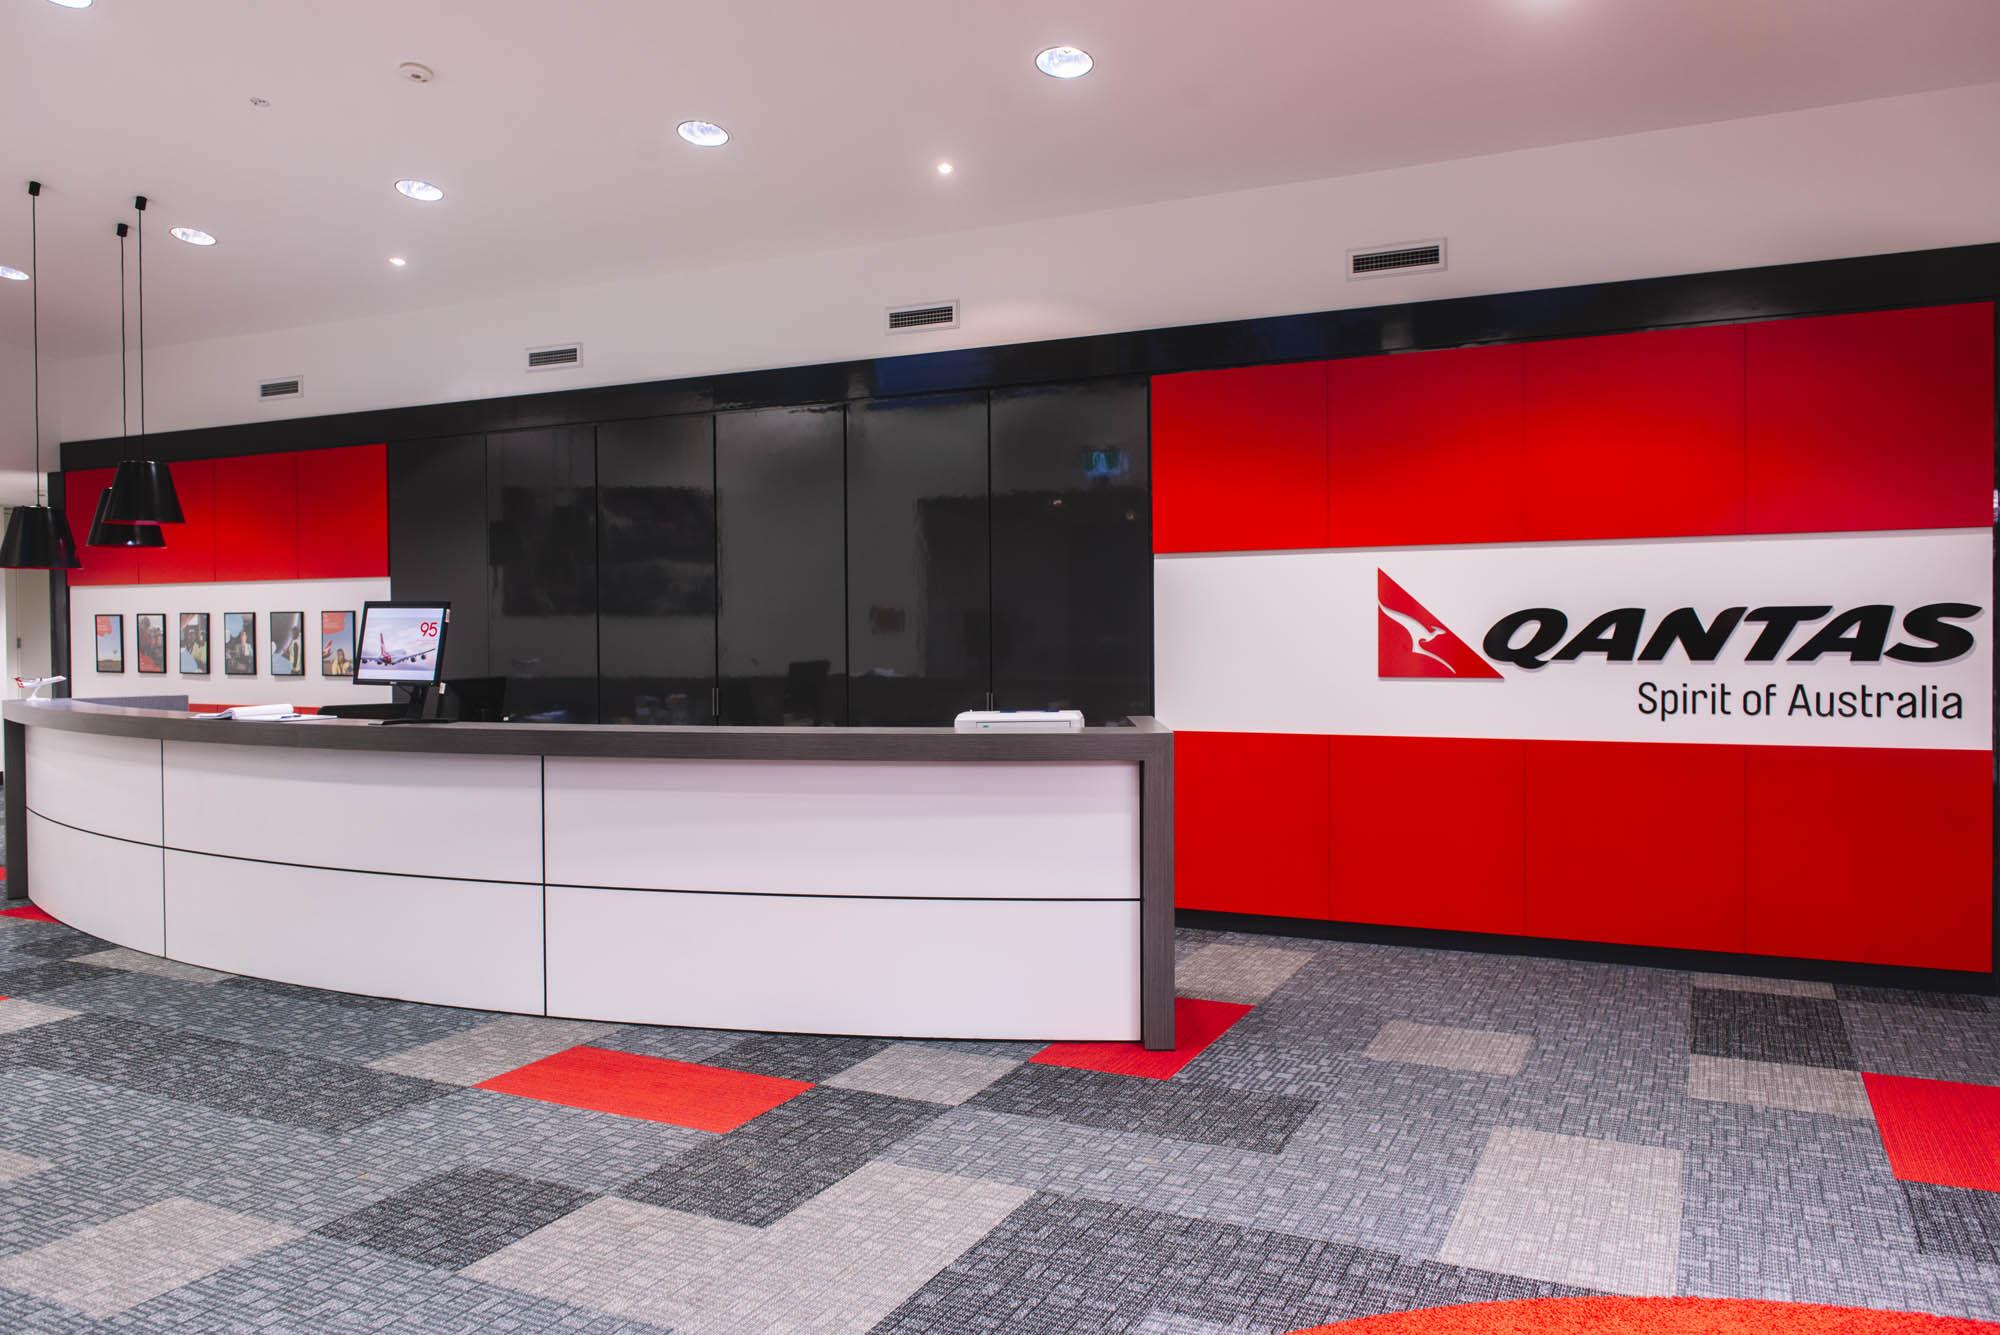 qantas hobart office fitout reception